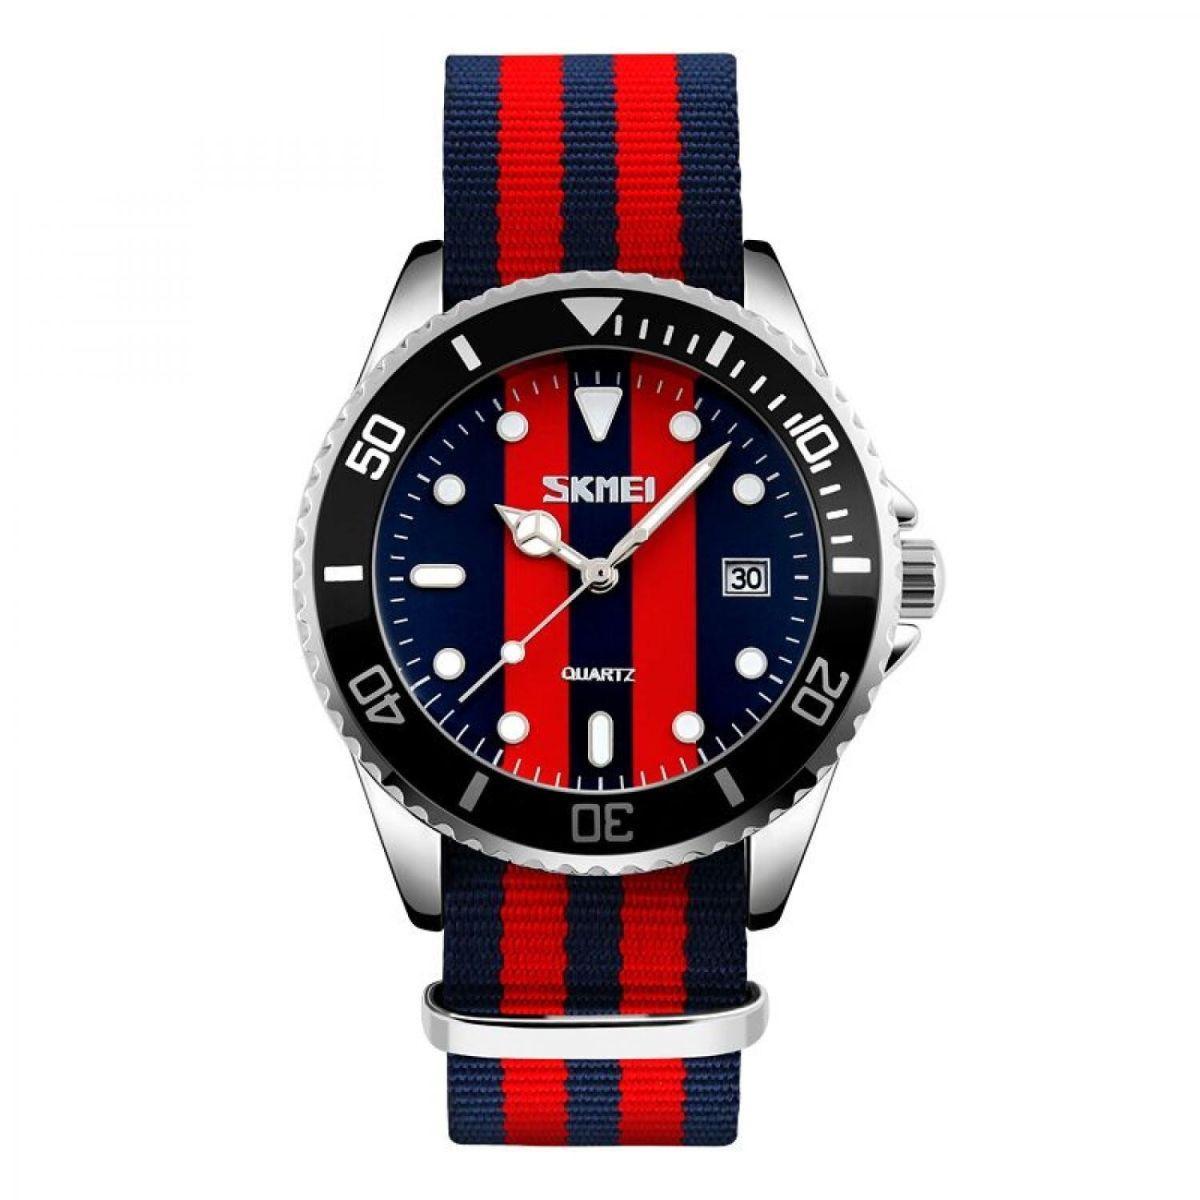 Часы Skmei 9133 Middle Dark Blue BOX (9133BOXMDBL)